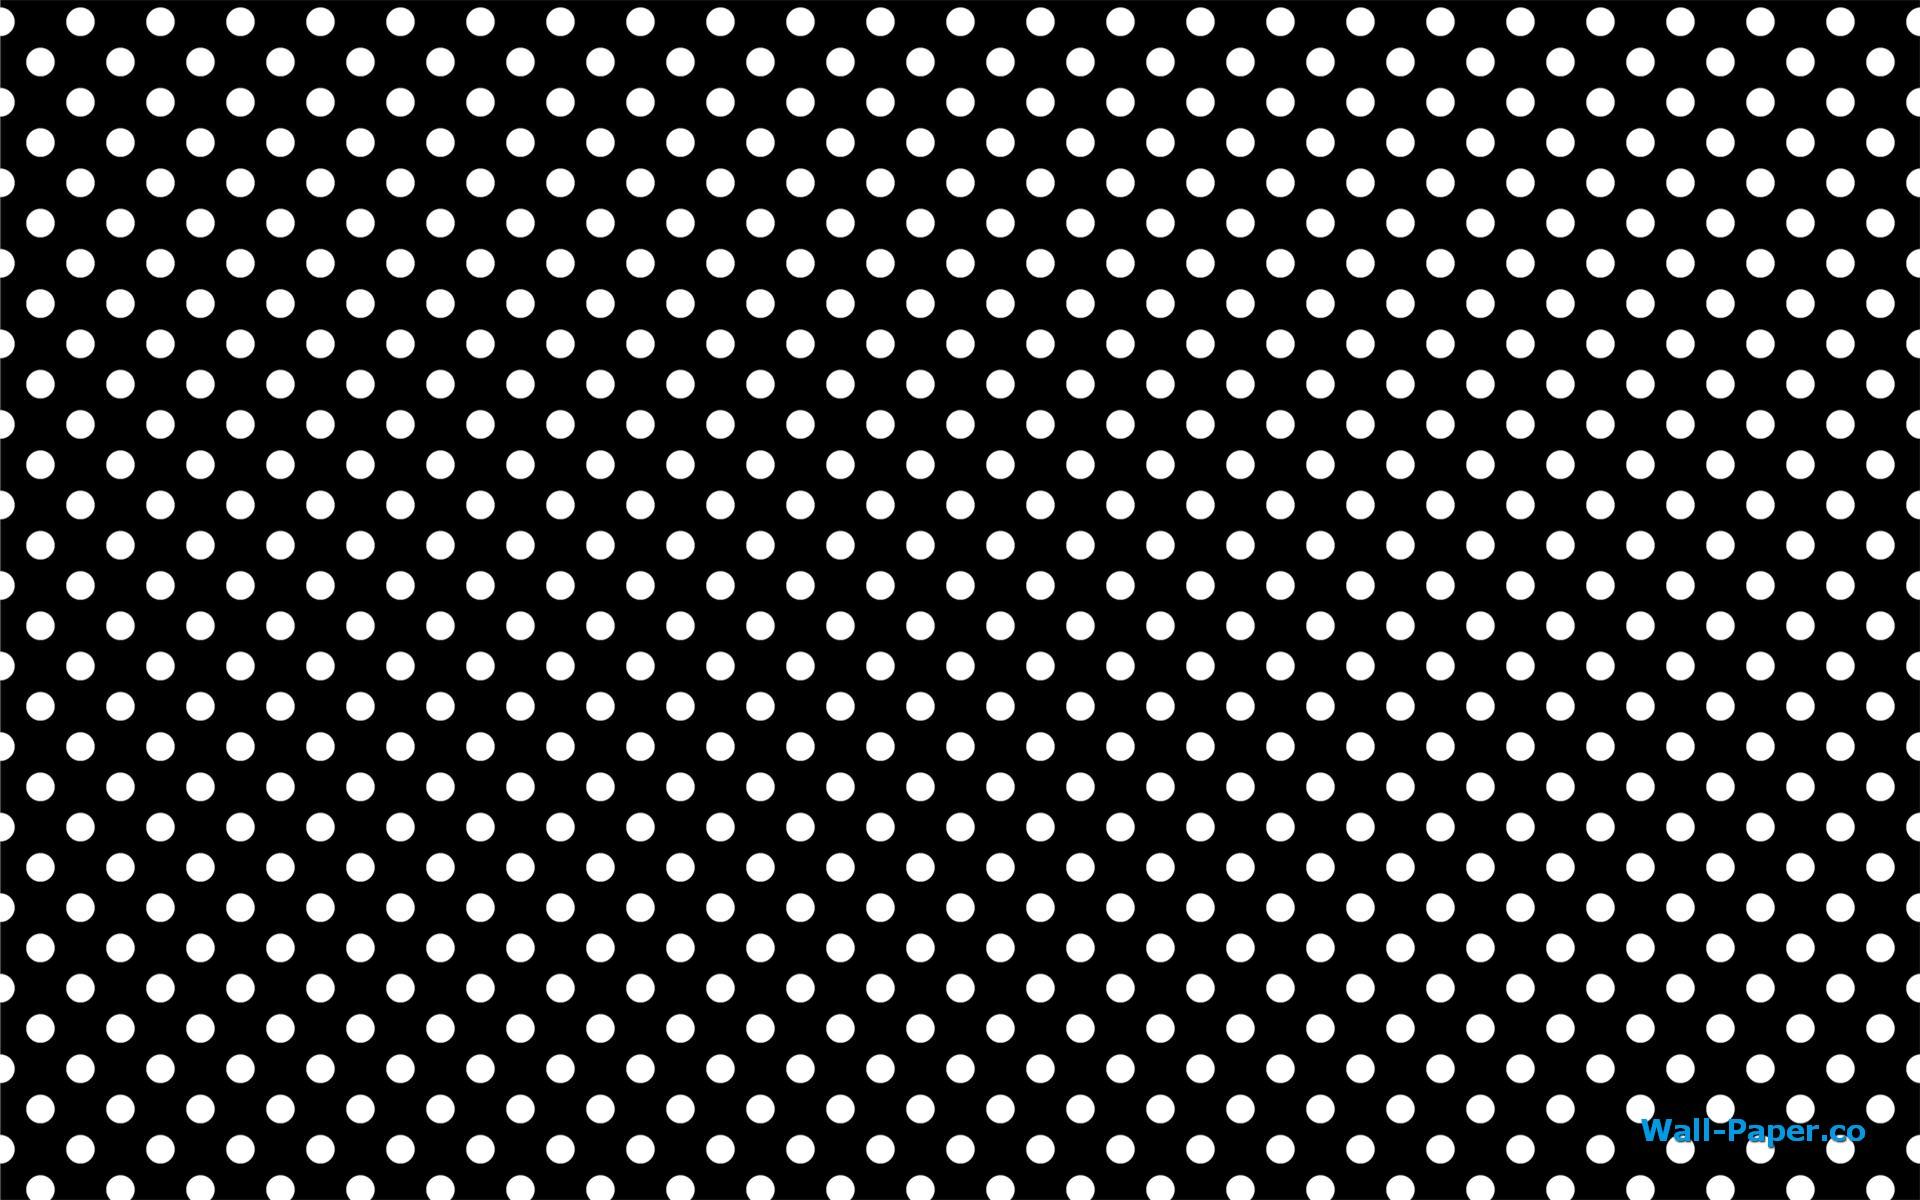 Black and white polka dot wallpapers 5 wallpapers hd for Polka dot wallpaper